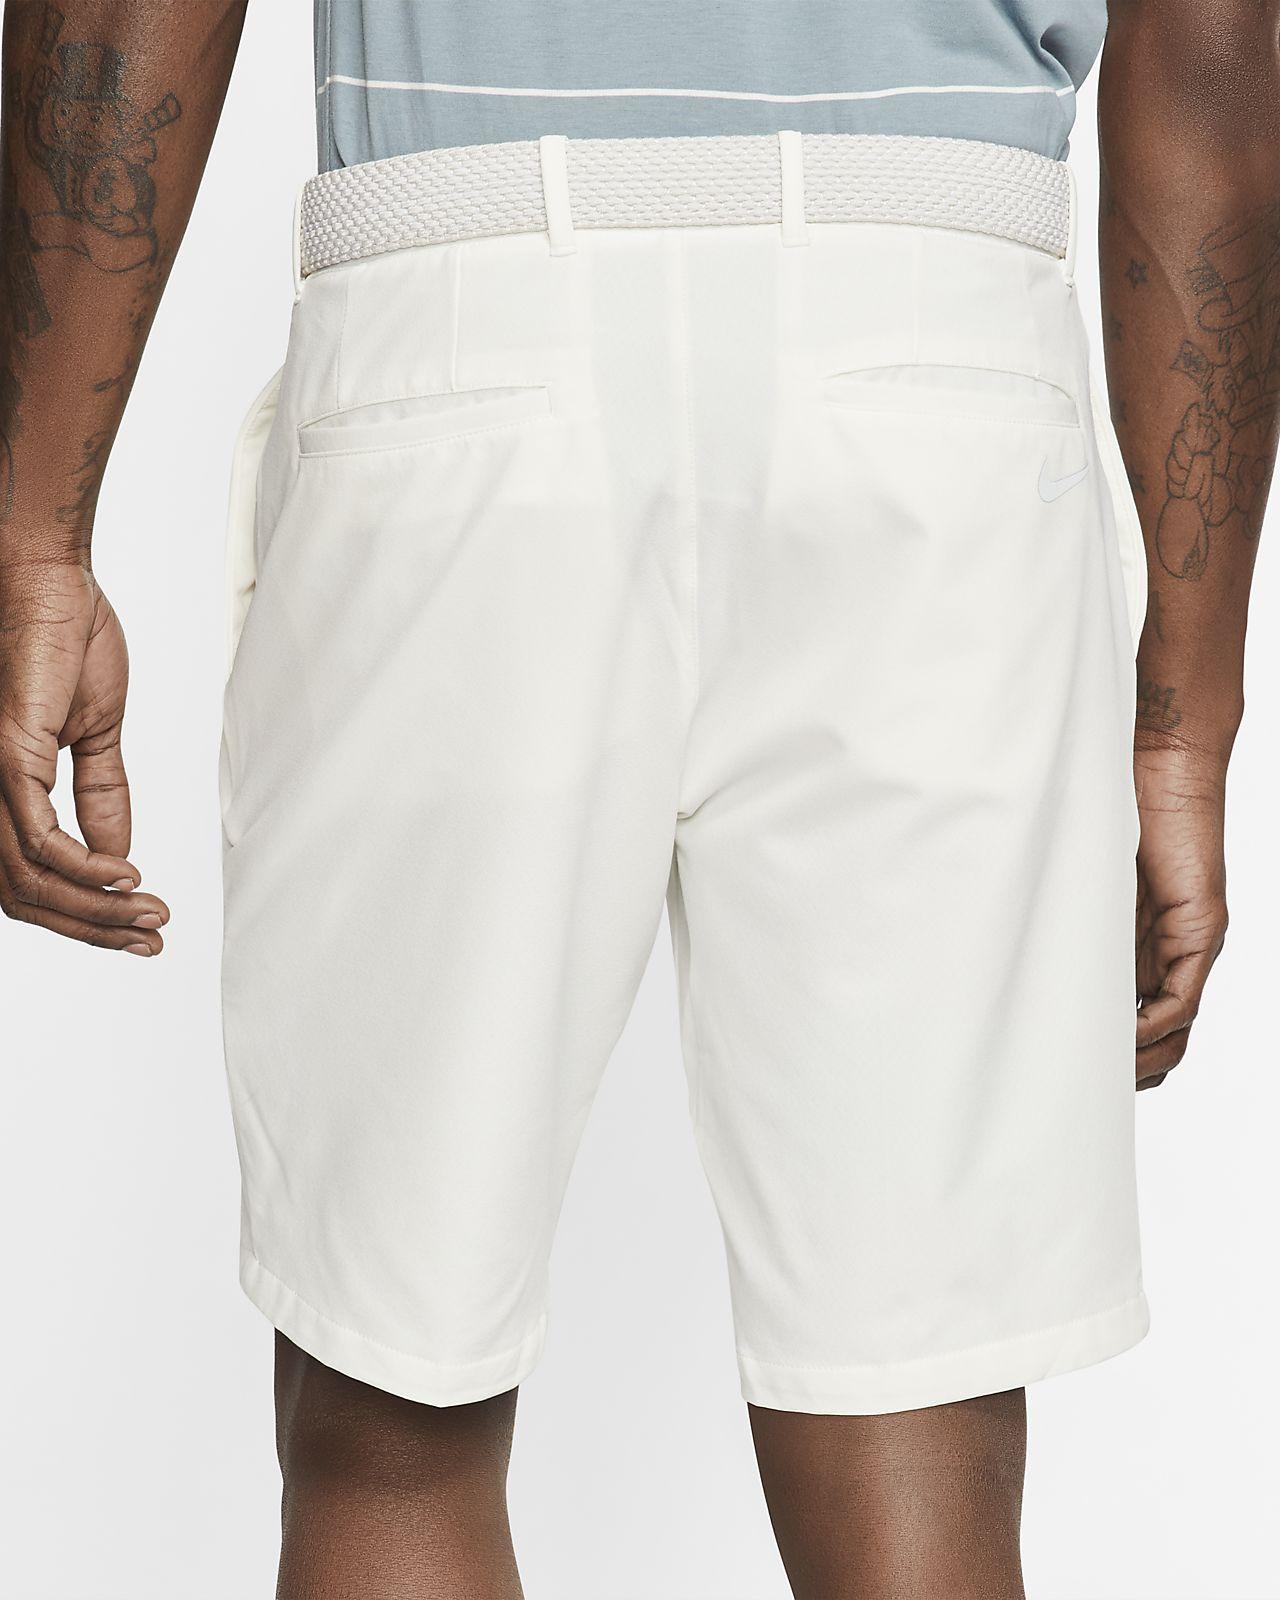 839fe91b7f9e Nike Flex Men s Slim-Fit Golf Shorts. Nike.com NL